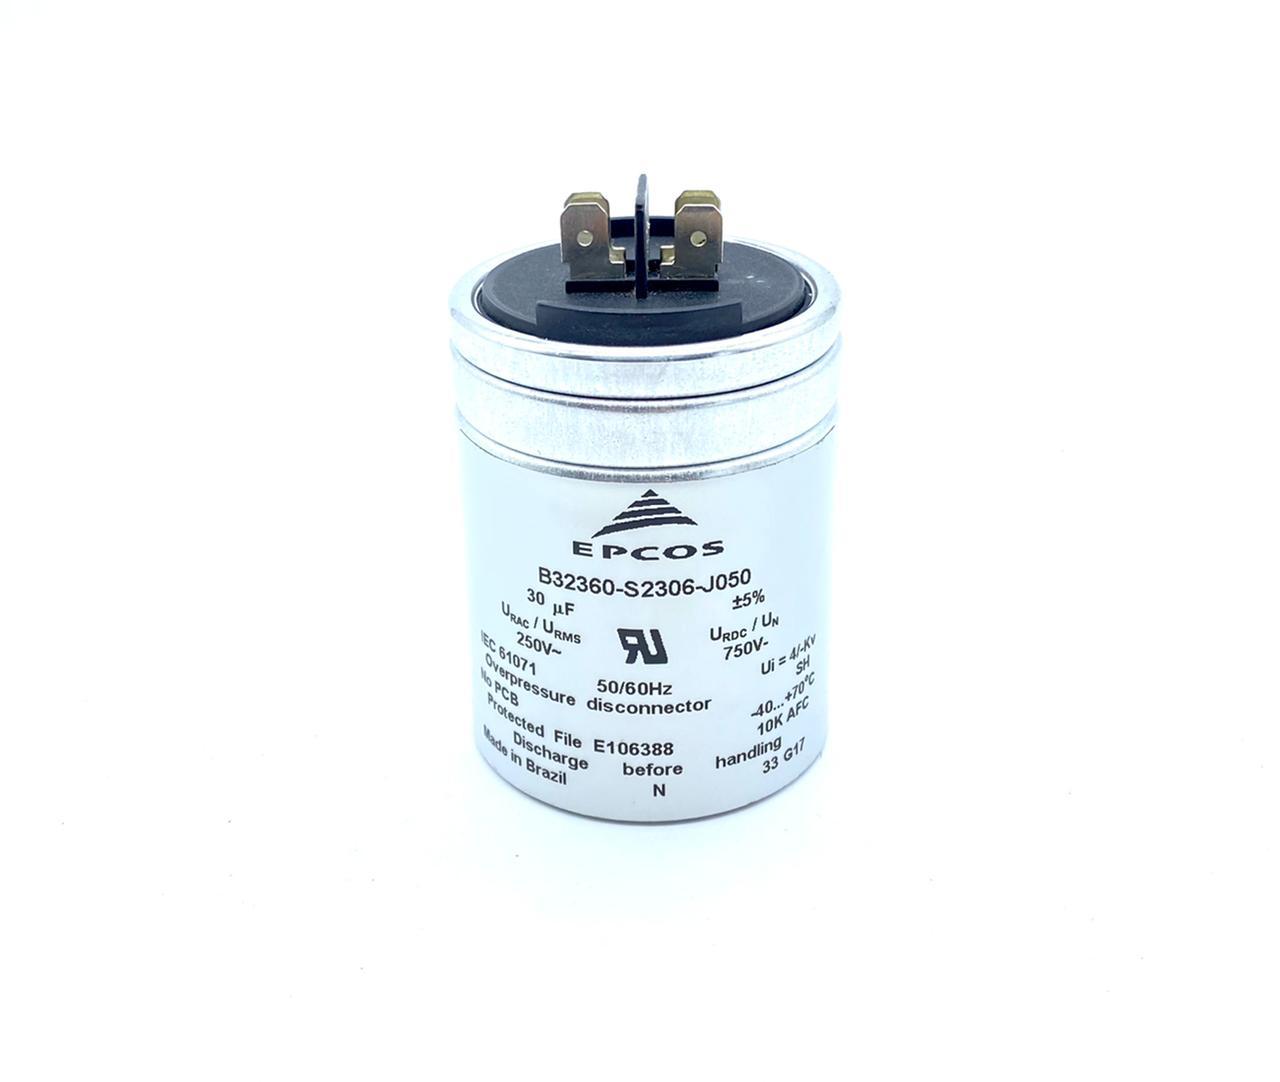 CAPACITOR PPM 30UF 250VCA 54X69MM FASTON B32360-S2306-J050 EPCOS (B32360S2306J050)